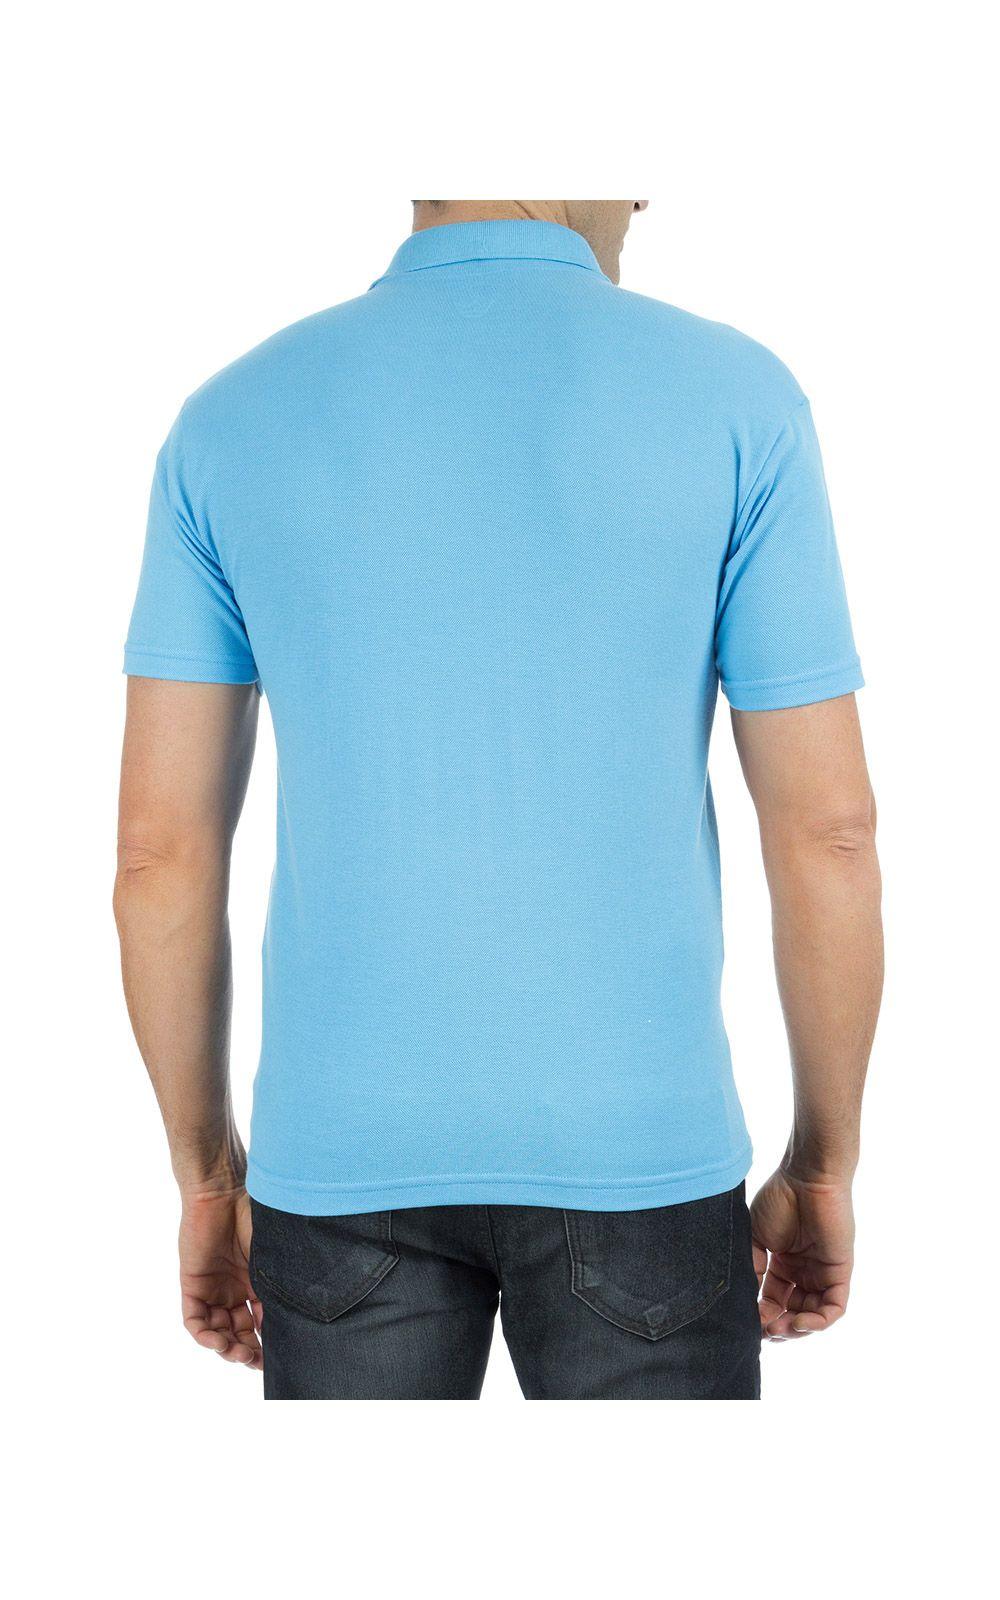 Foto 2 - Camisa Polo Masculina Azul Claro Bordada